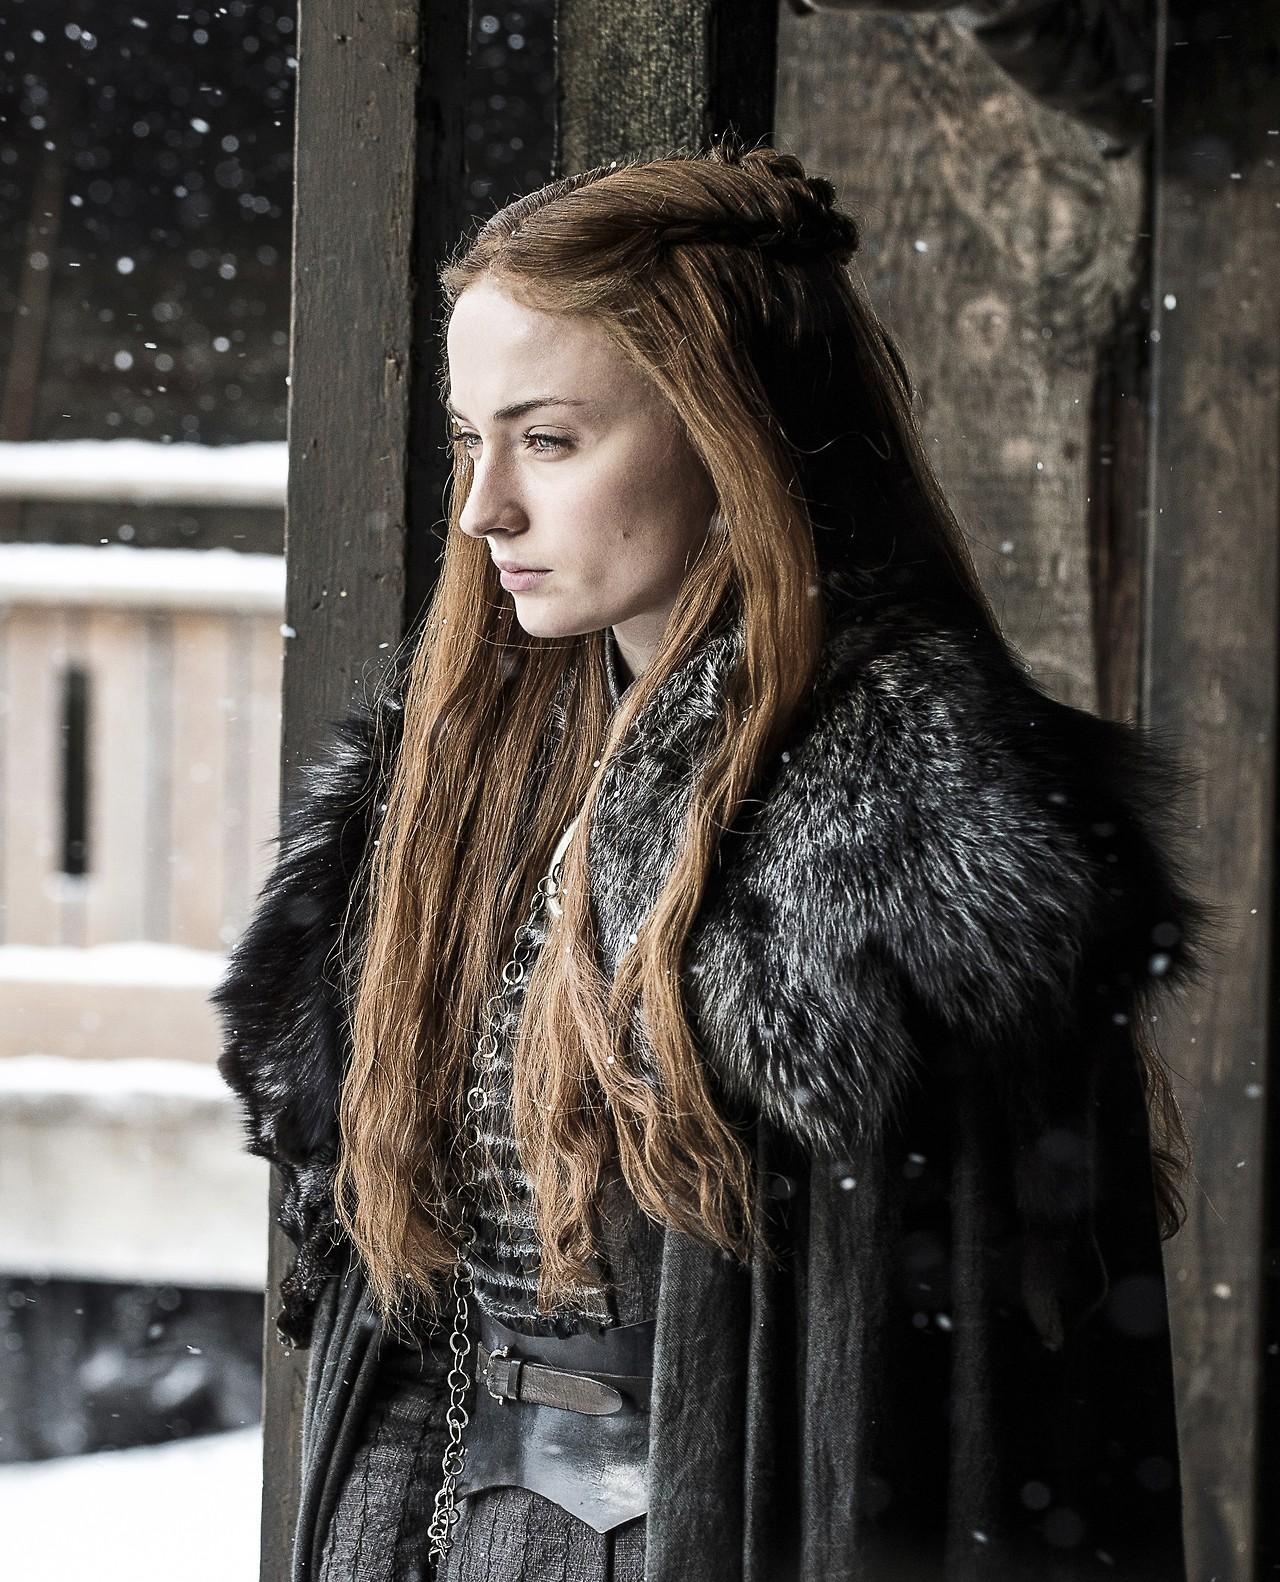 Sansa Stark character costumes. fadedwindmills.com